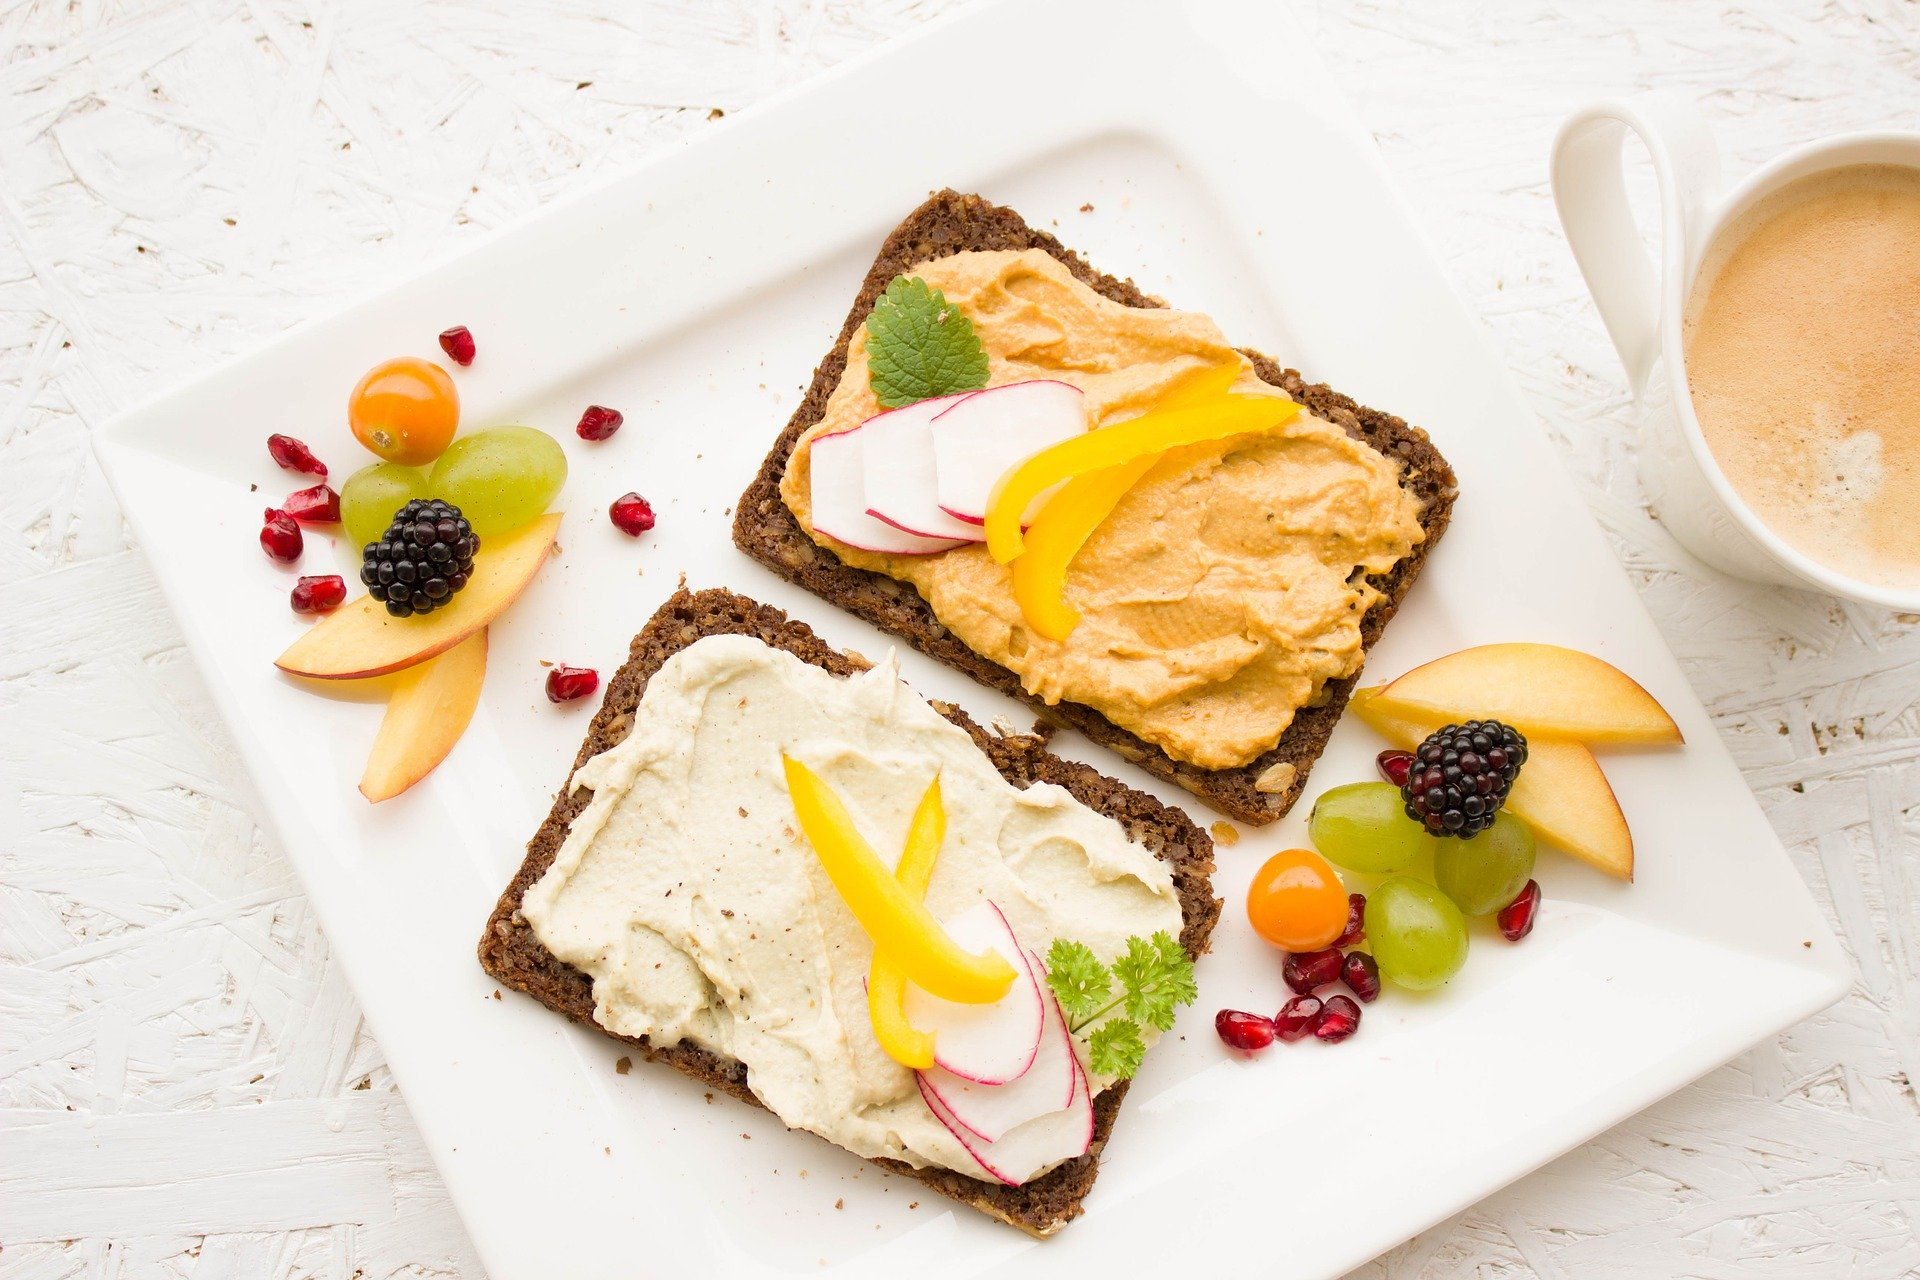 sund og god mad